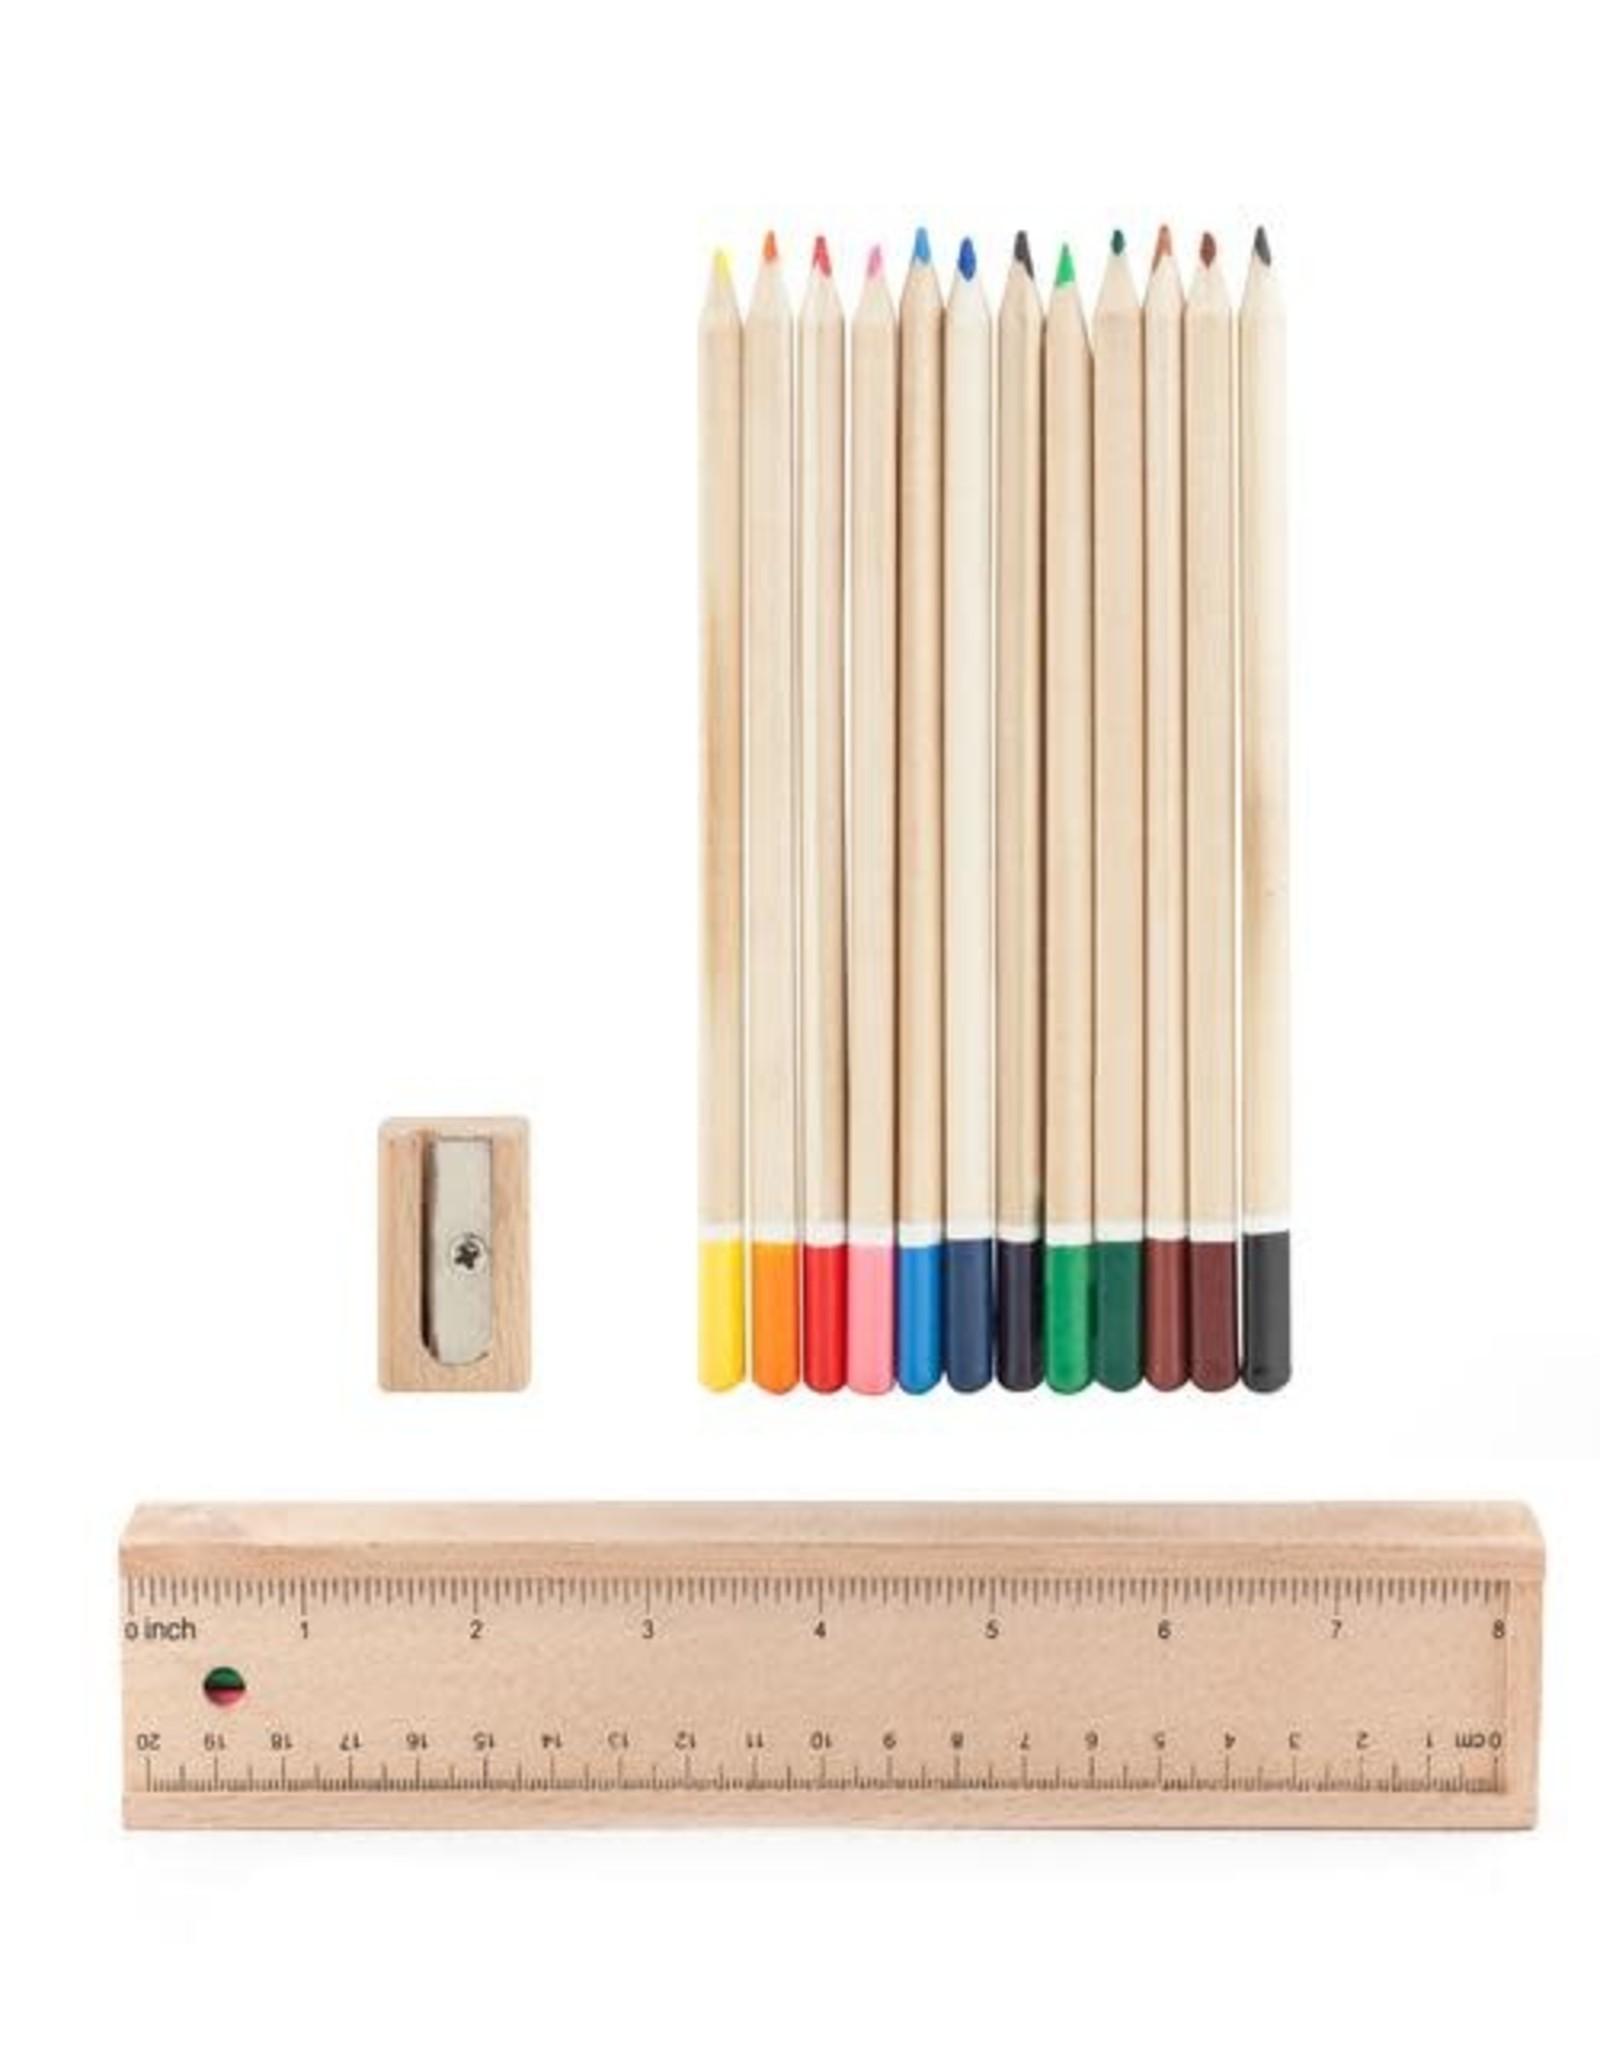 Kikkerland Wood Pencil Doodle Box - Kikkerland